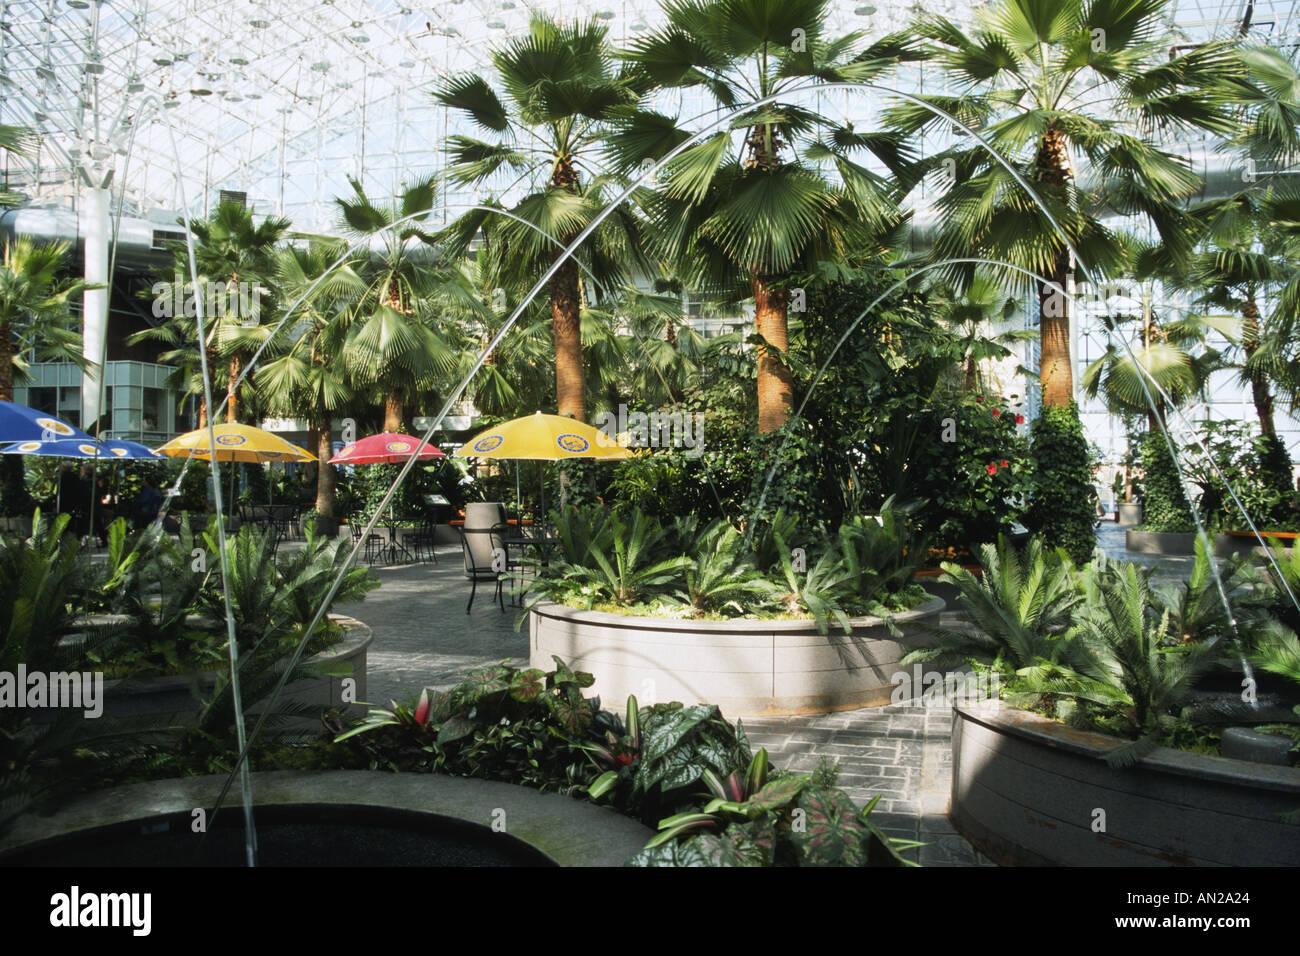 Navy pier palmen chicago illinois kristallgarten indoor garten brunnen schie en wasser b gen - Indoor garten ...